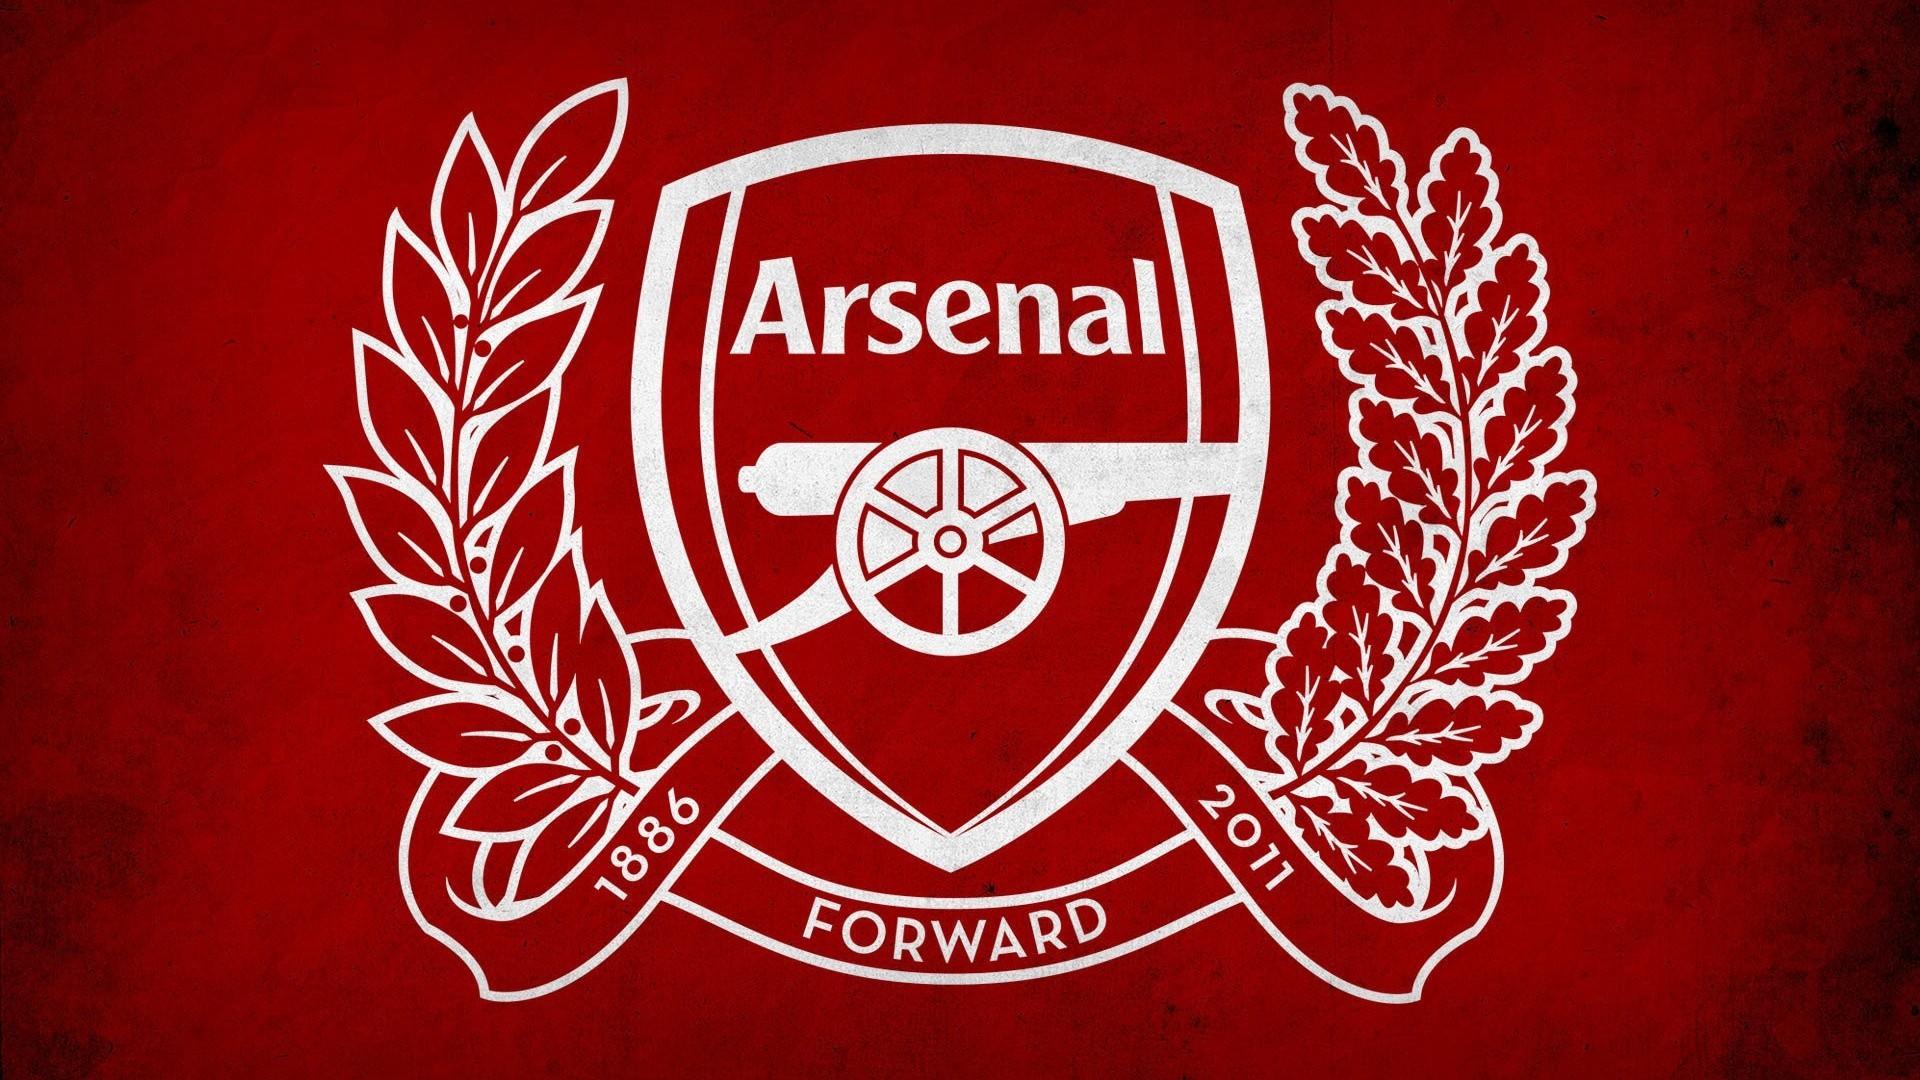 Логотип арсенала лондон